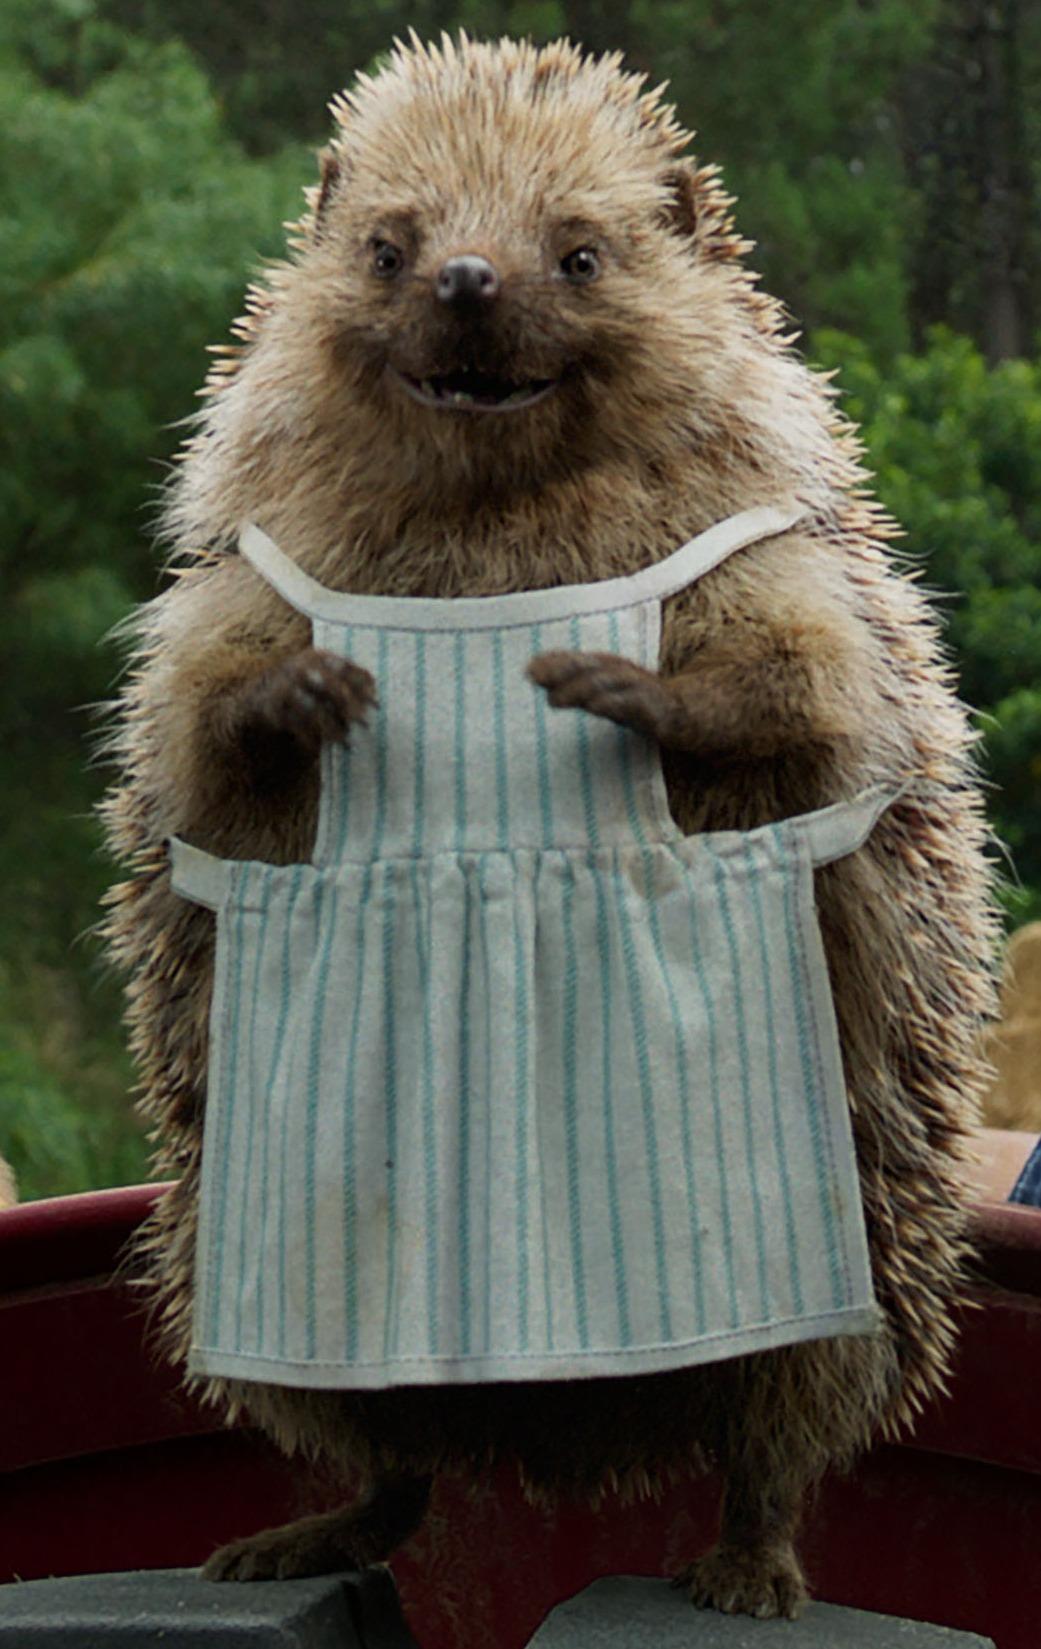 Mrs. Tiggy-Winkle